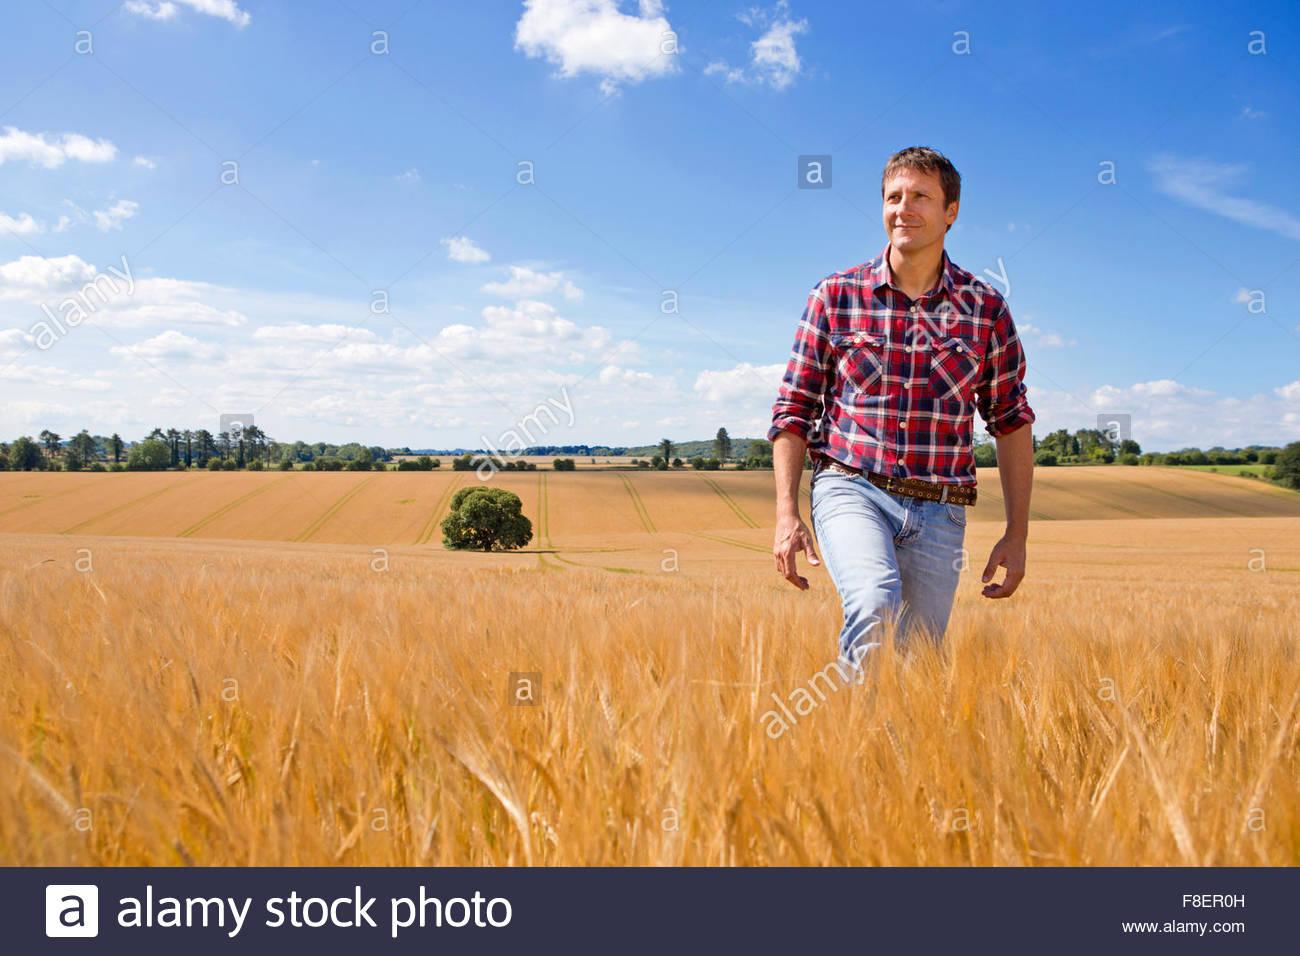 Farmer walking in sunny rural barley crop field in summer Stock Photo